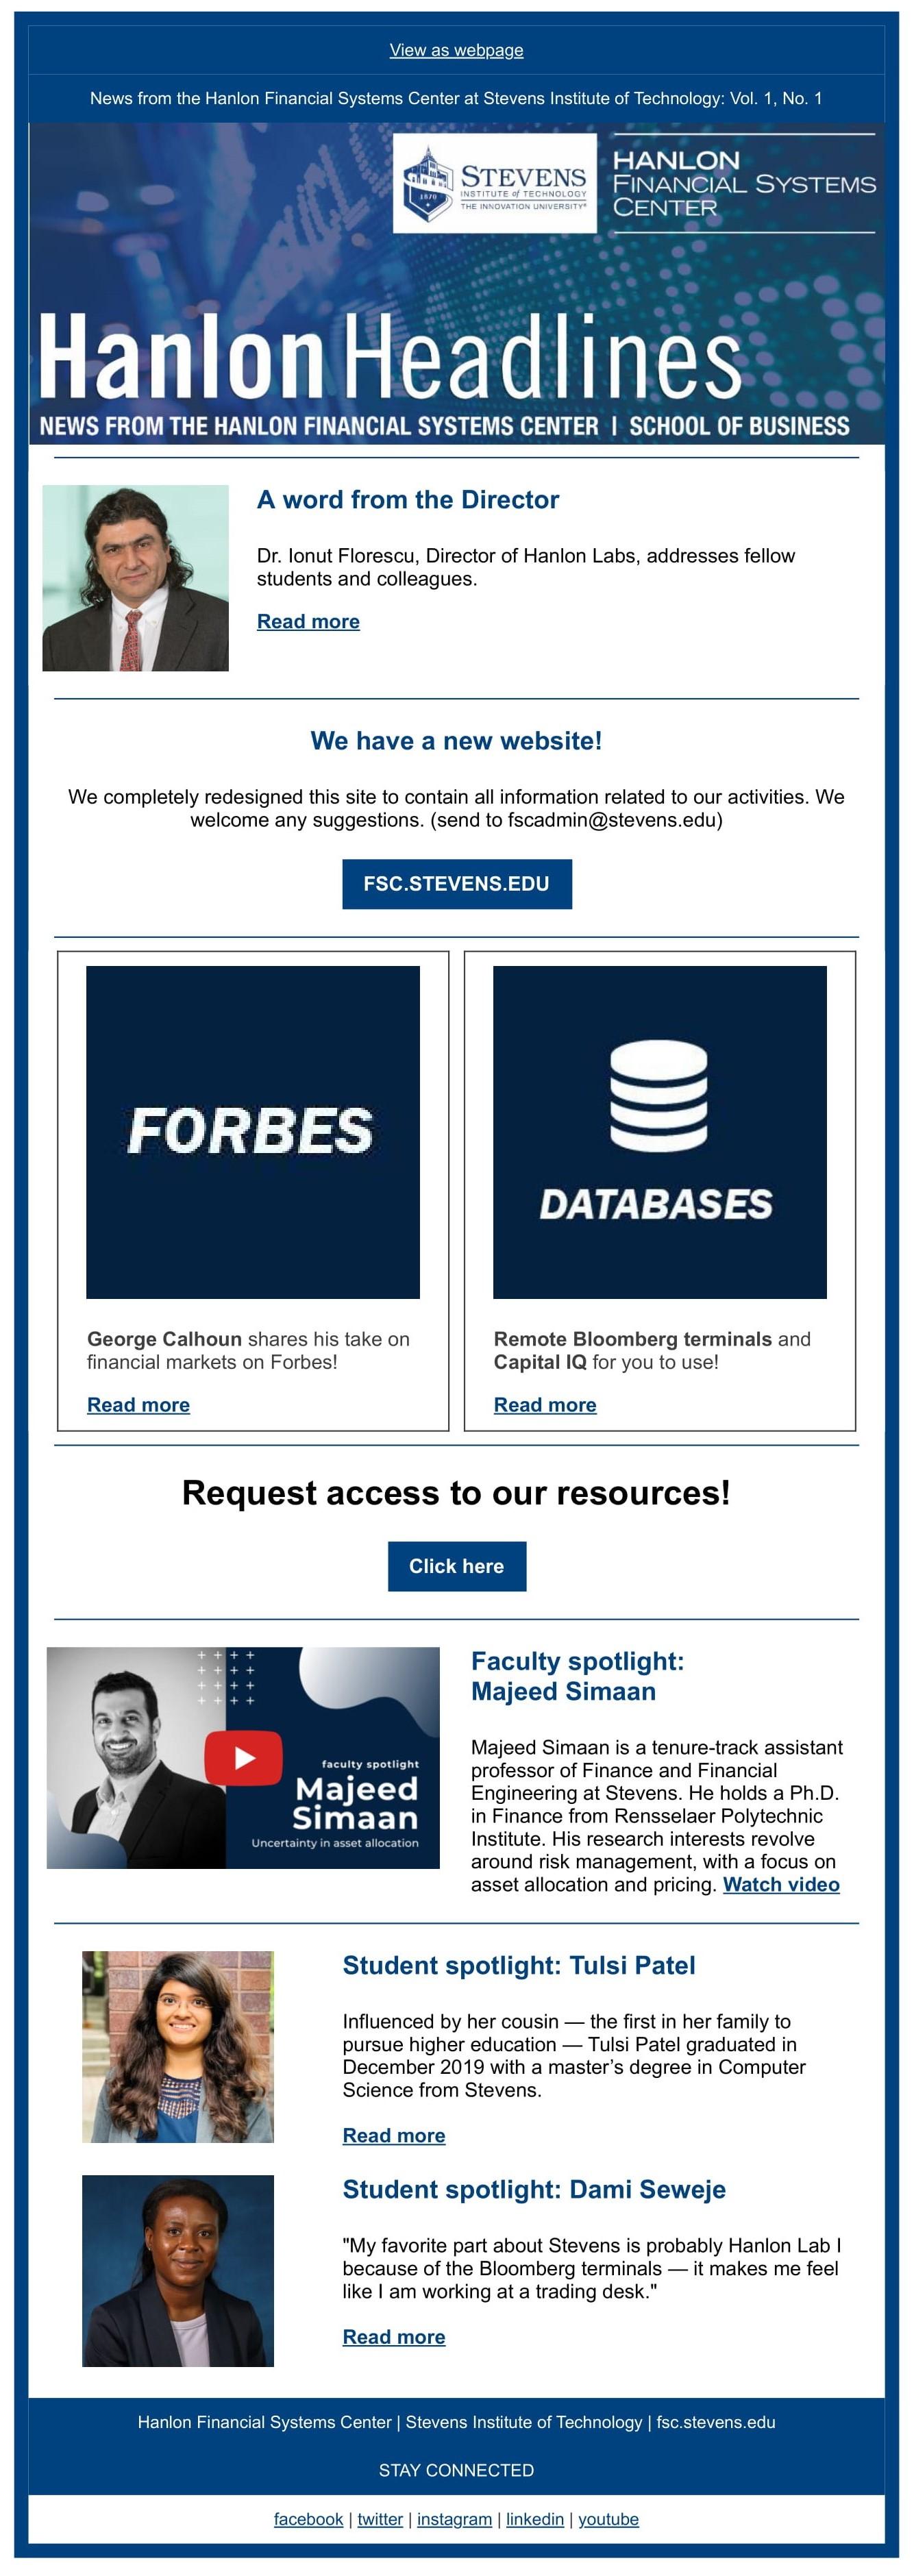 HFSL_February_2021_Newsletter_image_web-1-1